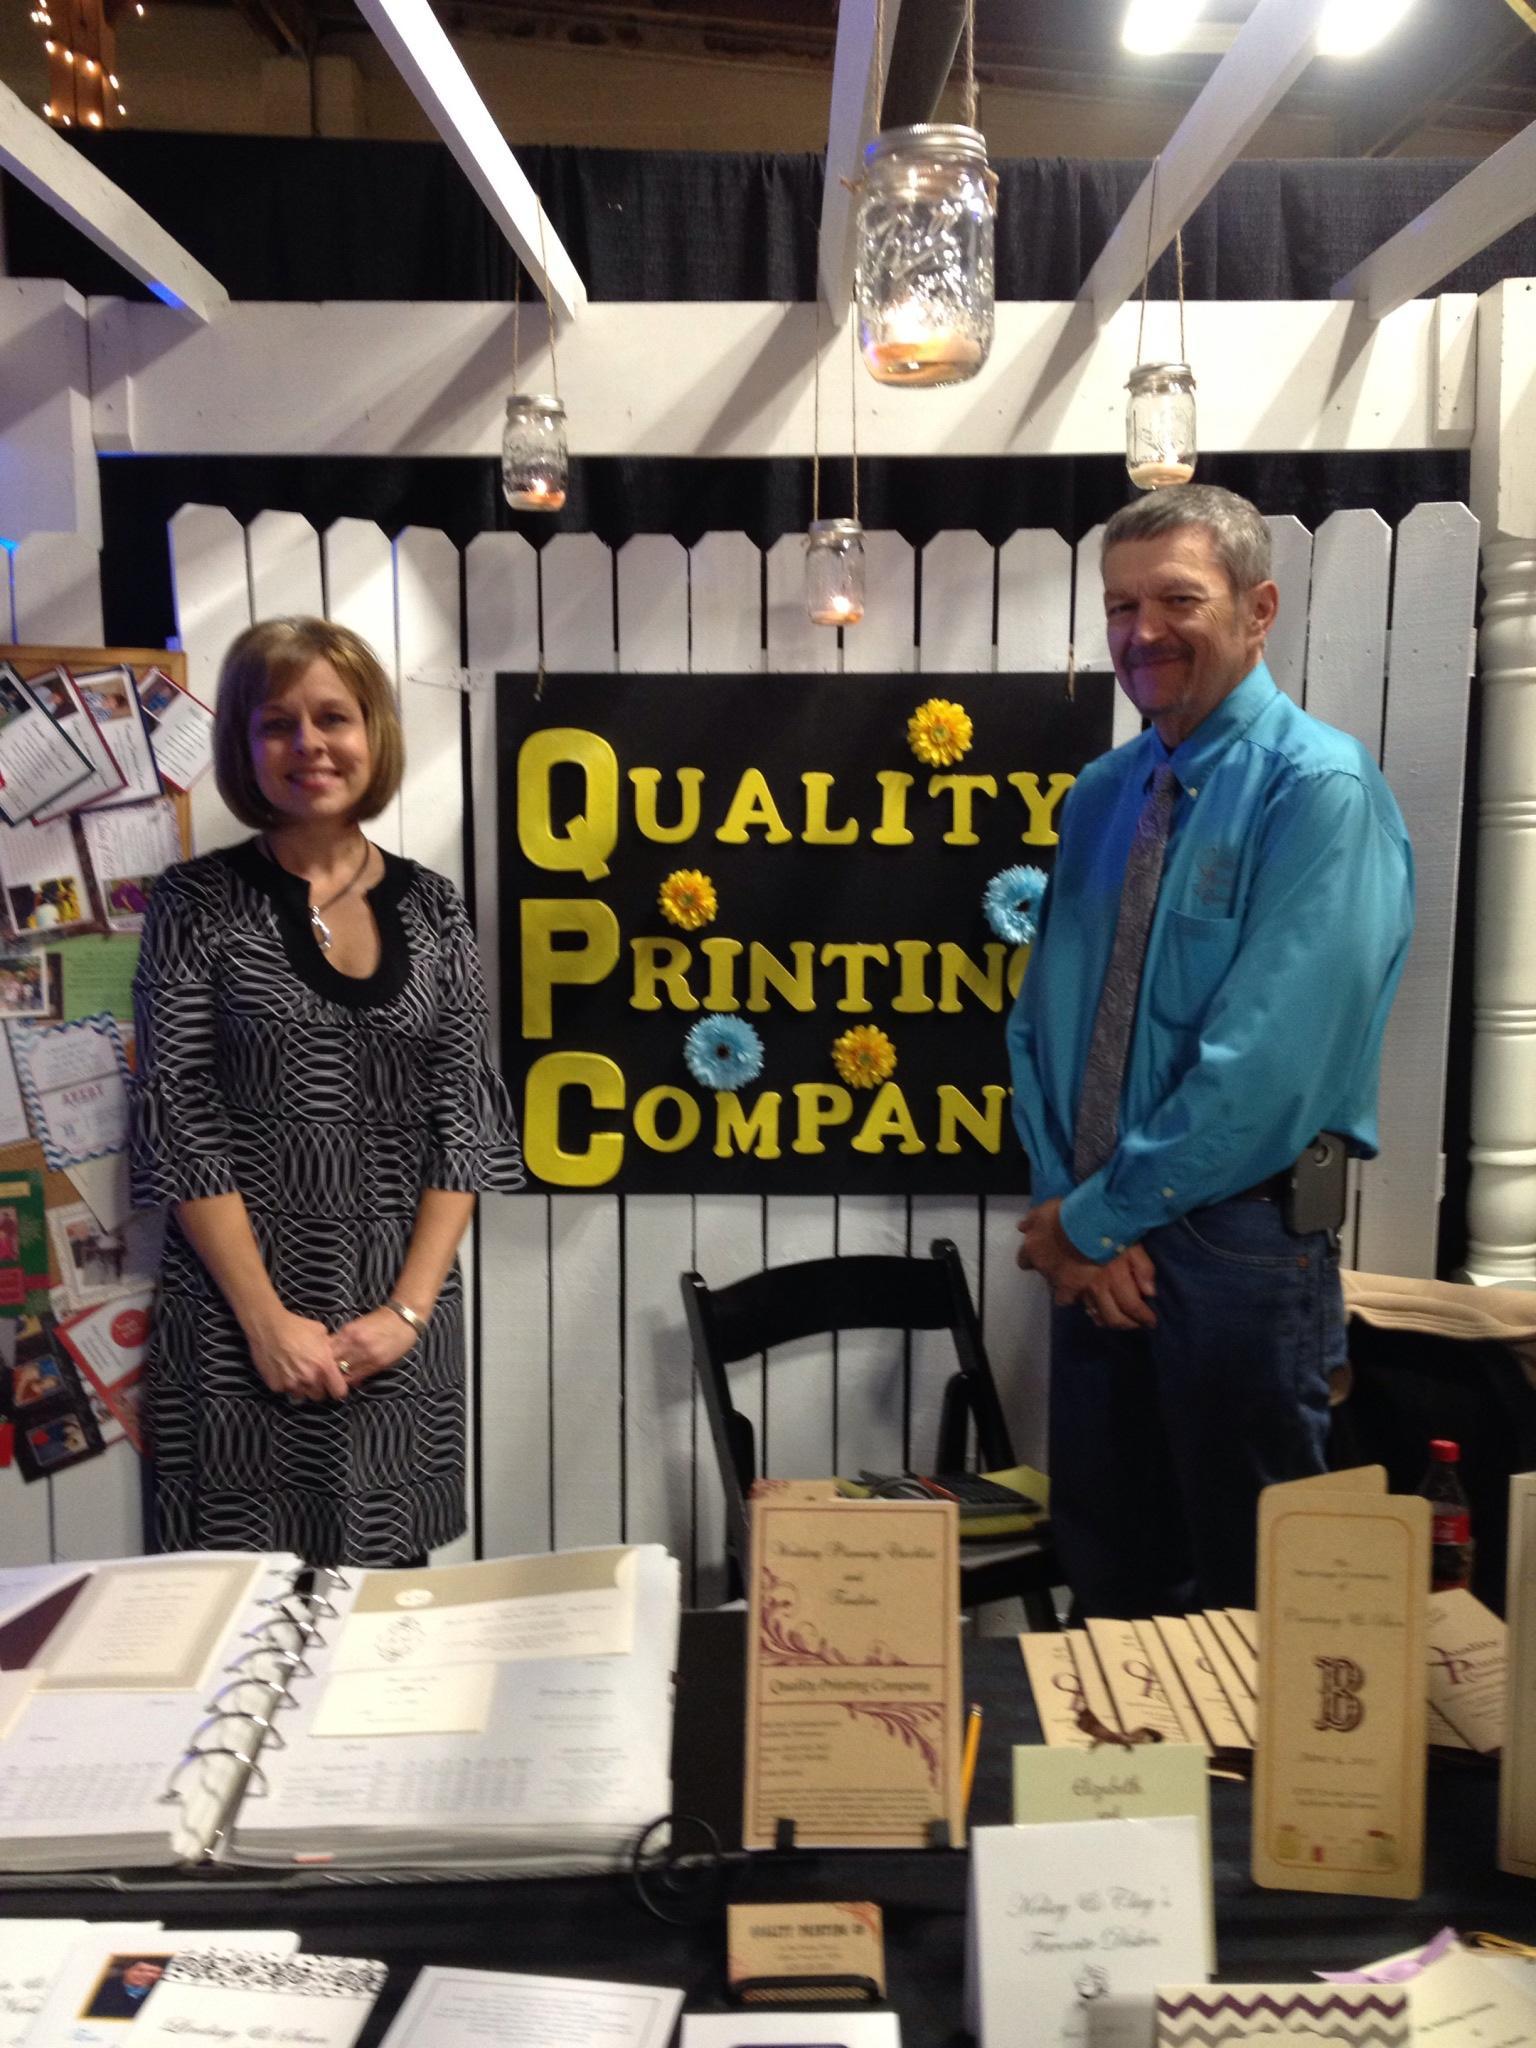 Quality Printing Company image 9